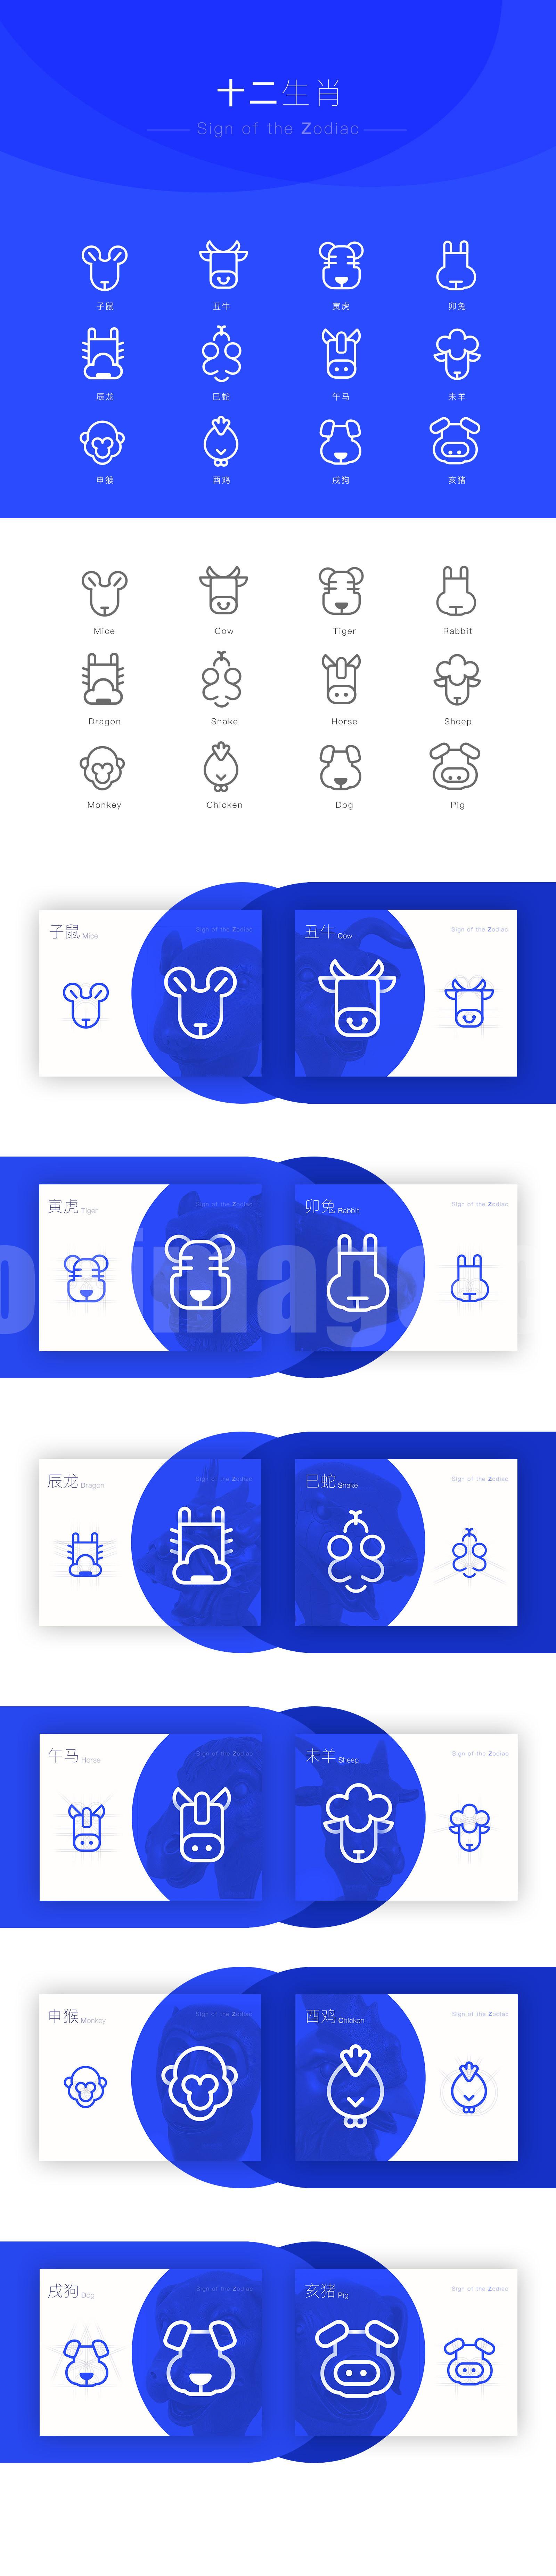 12生肖图标 sketch 模板icon源文件下载